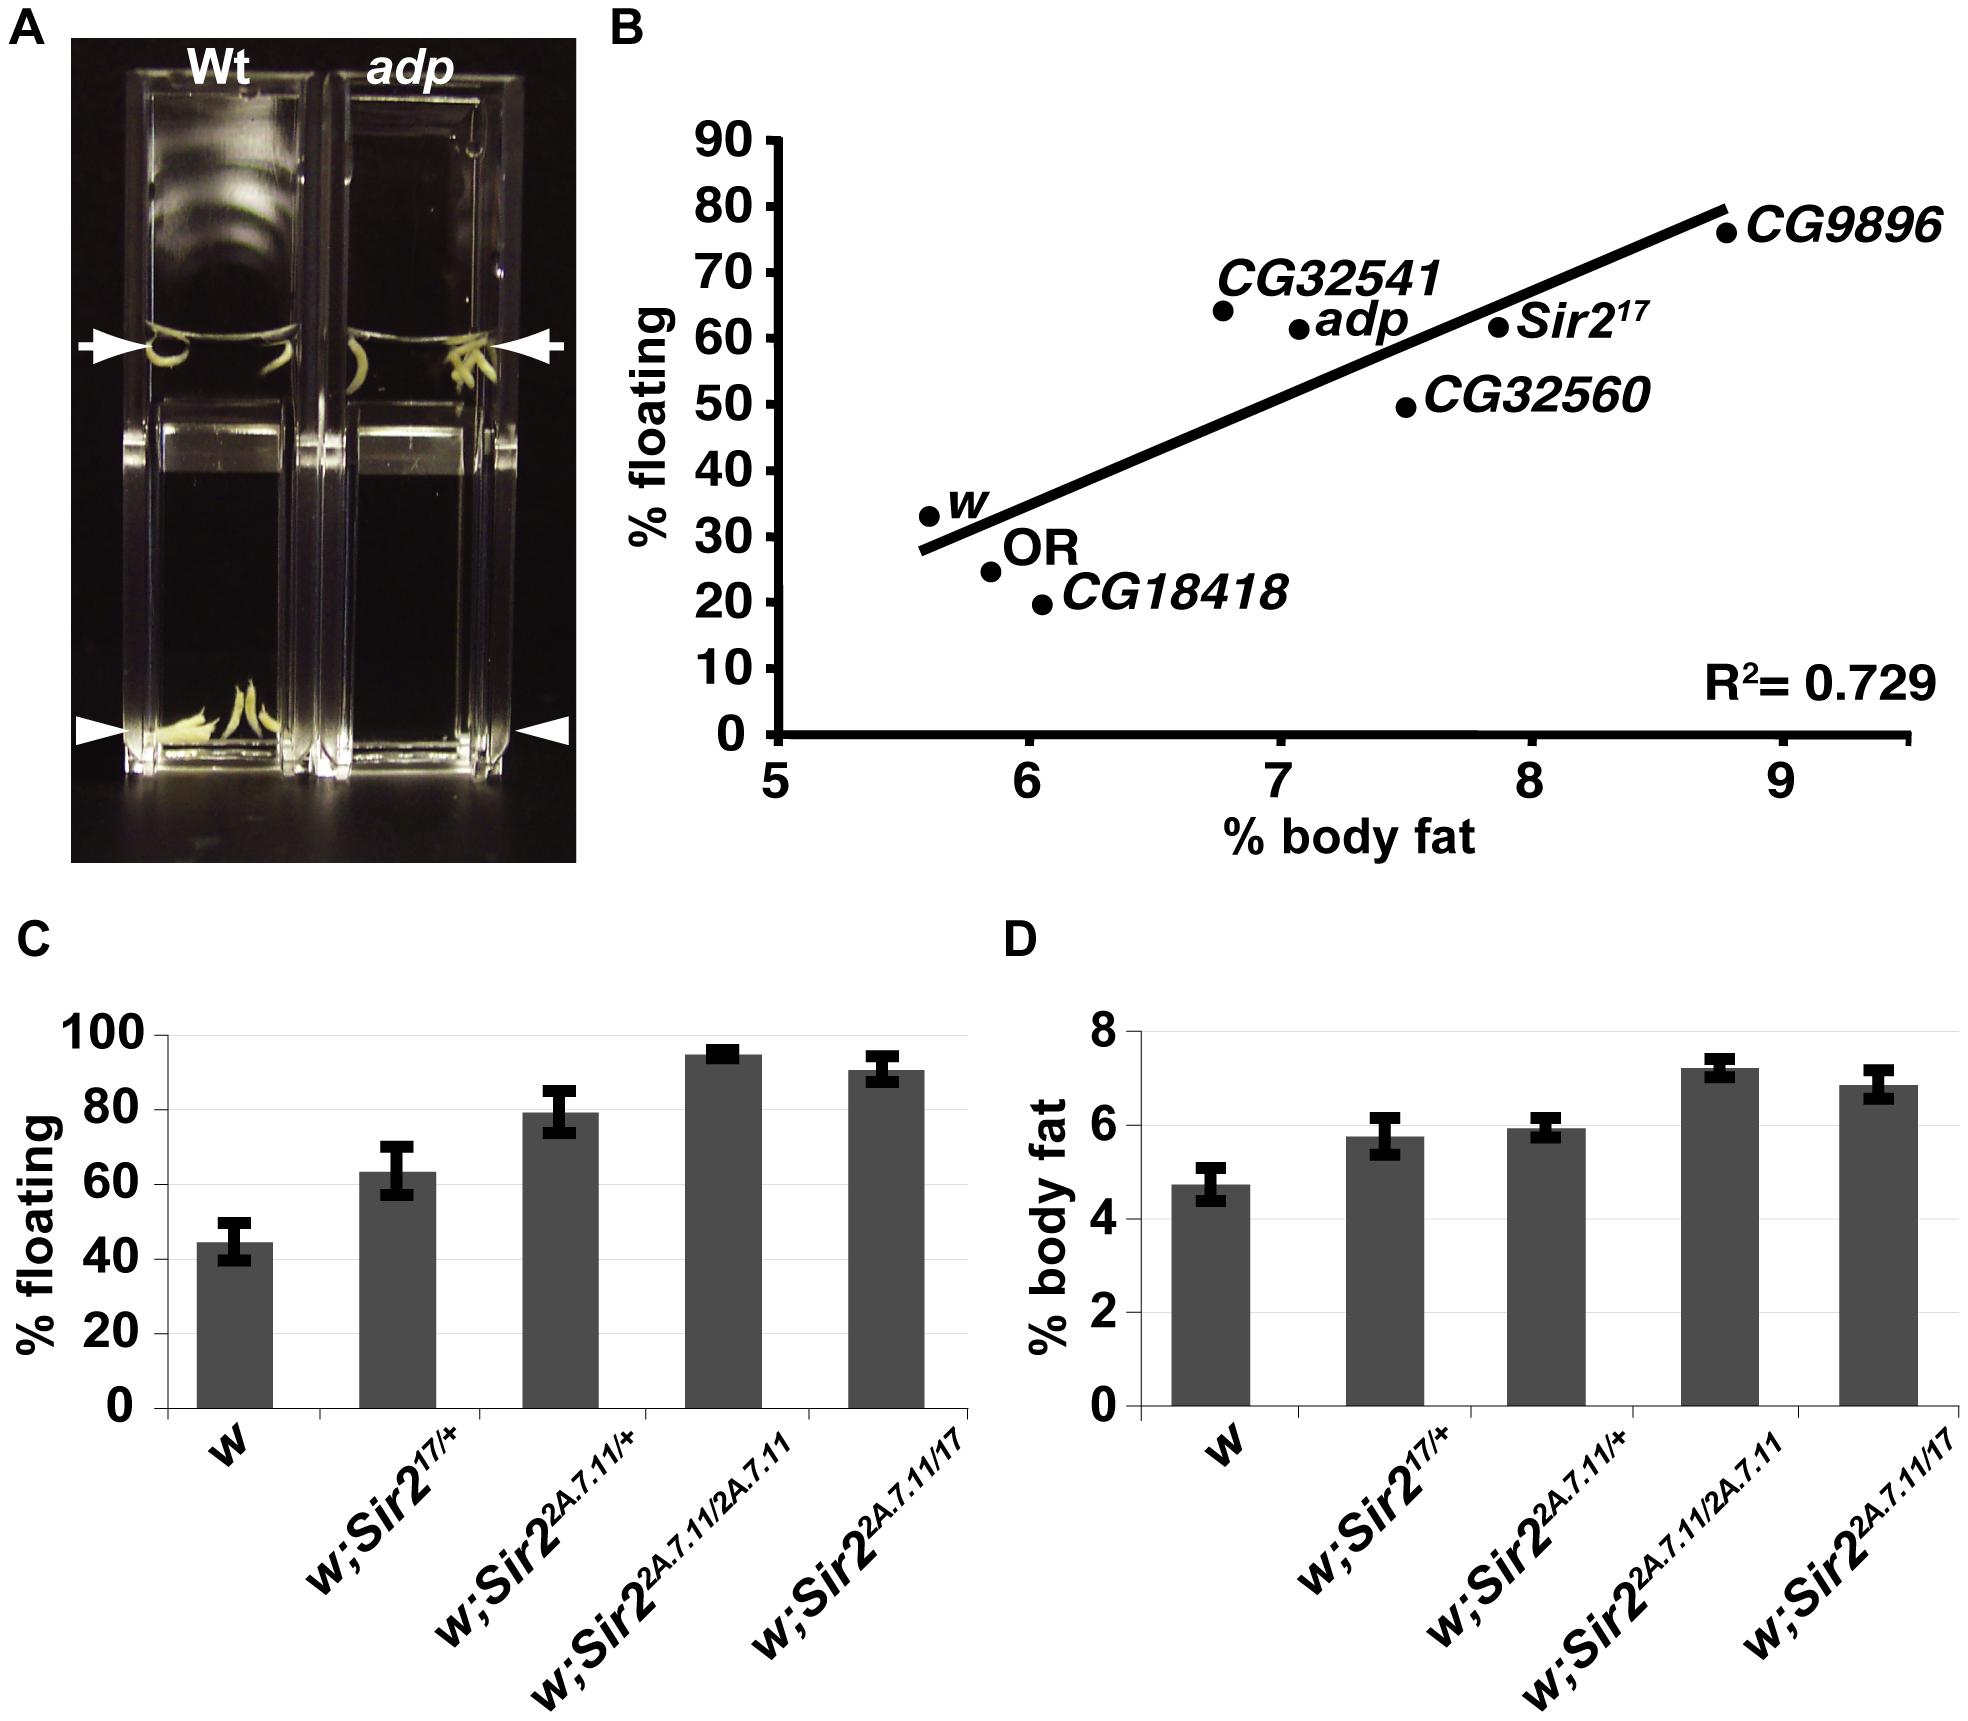 A buoyancy-based screen identifies a role for Sir2 in regulating fat levels in Drosophila larvae.